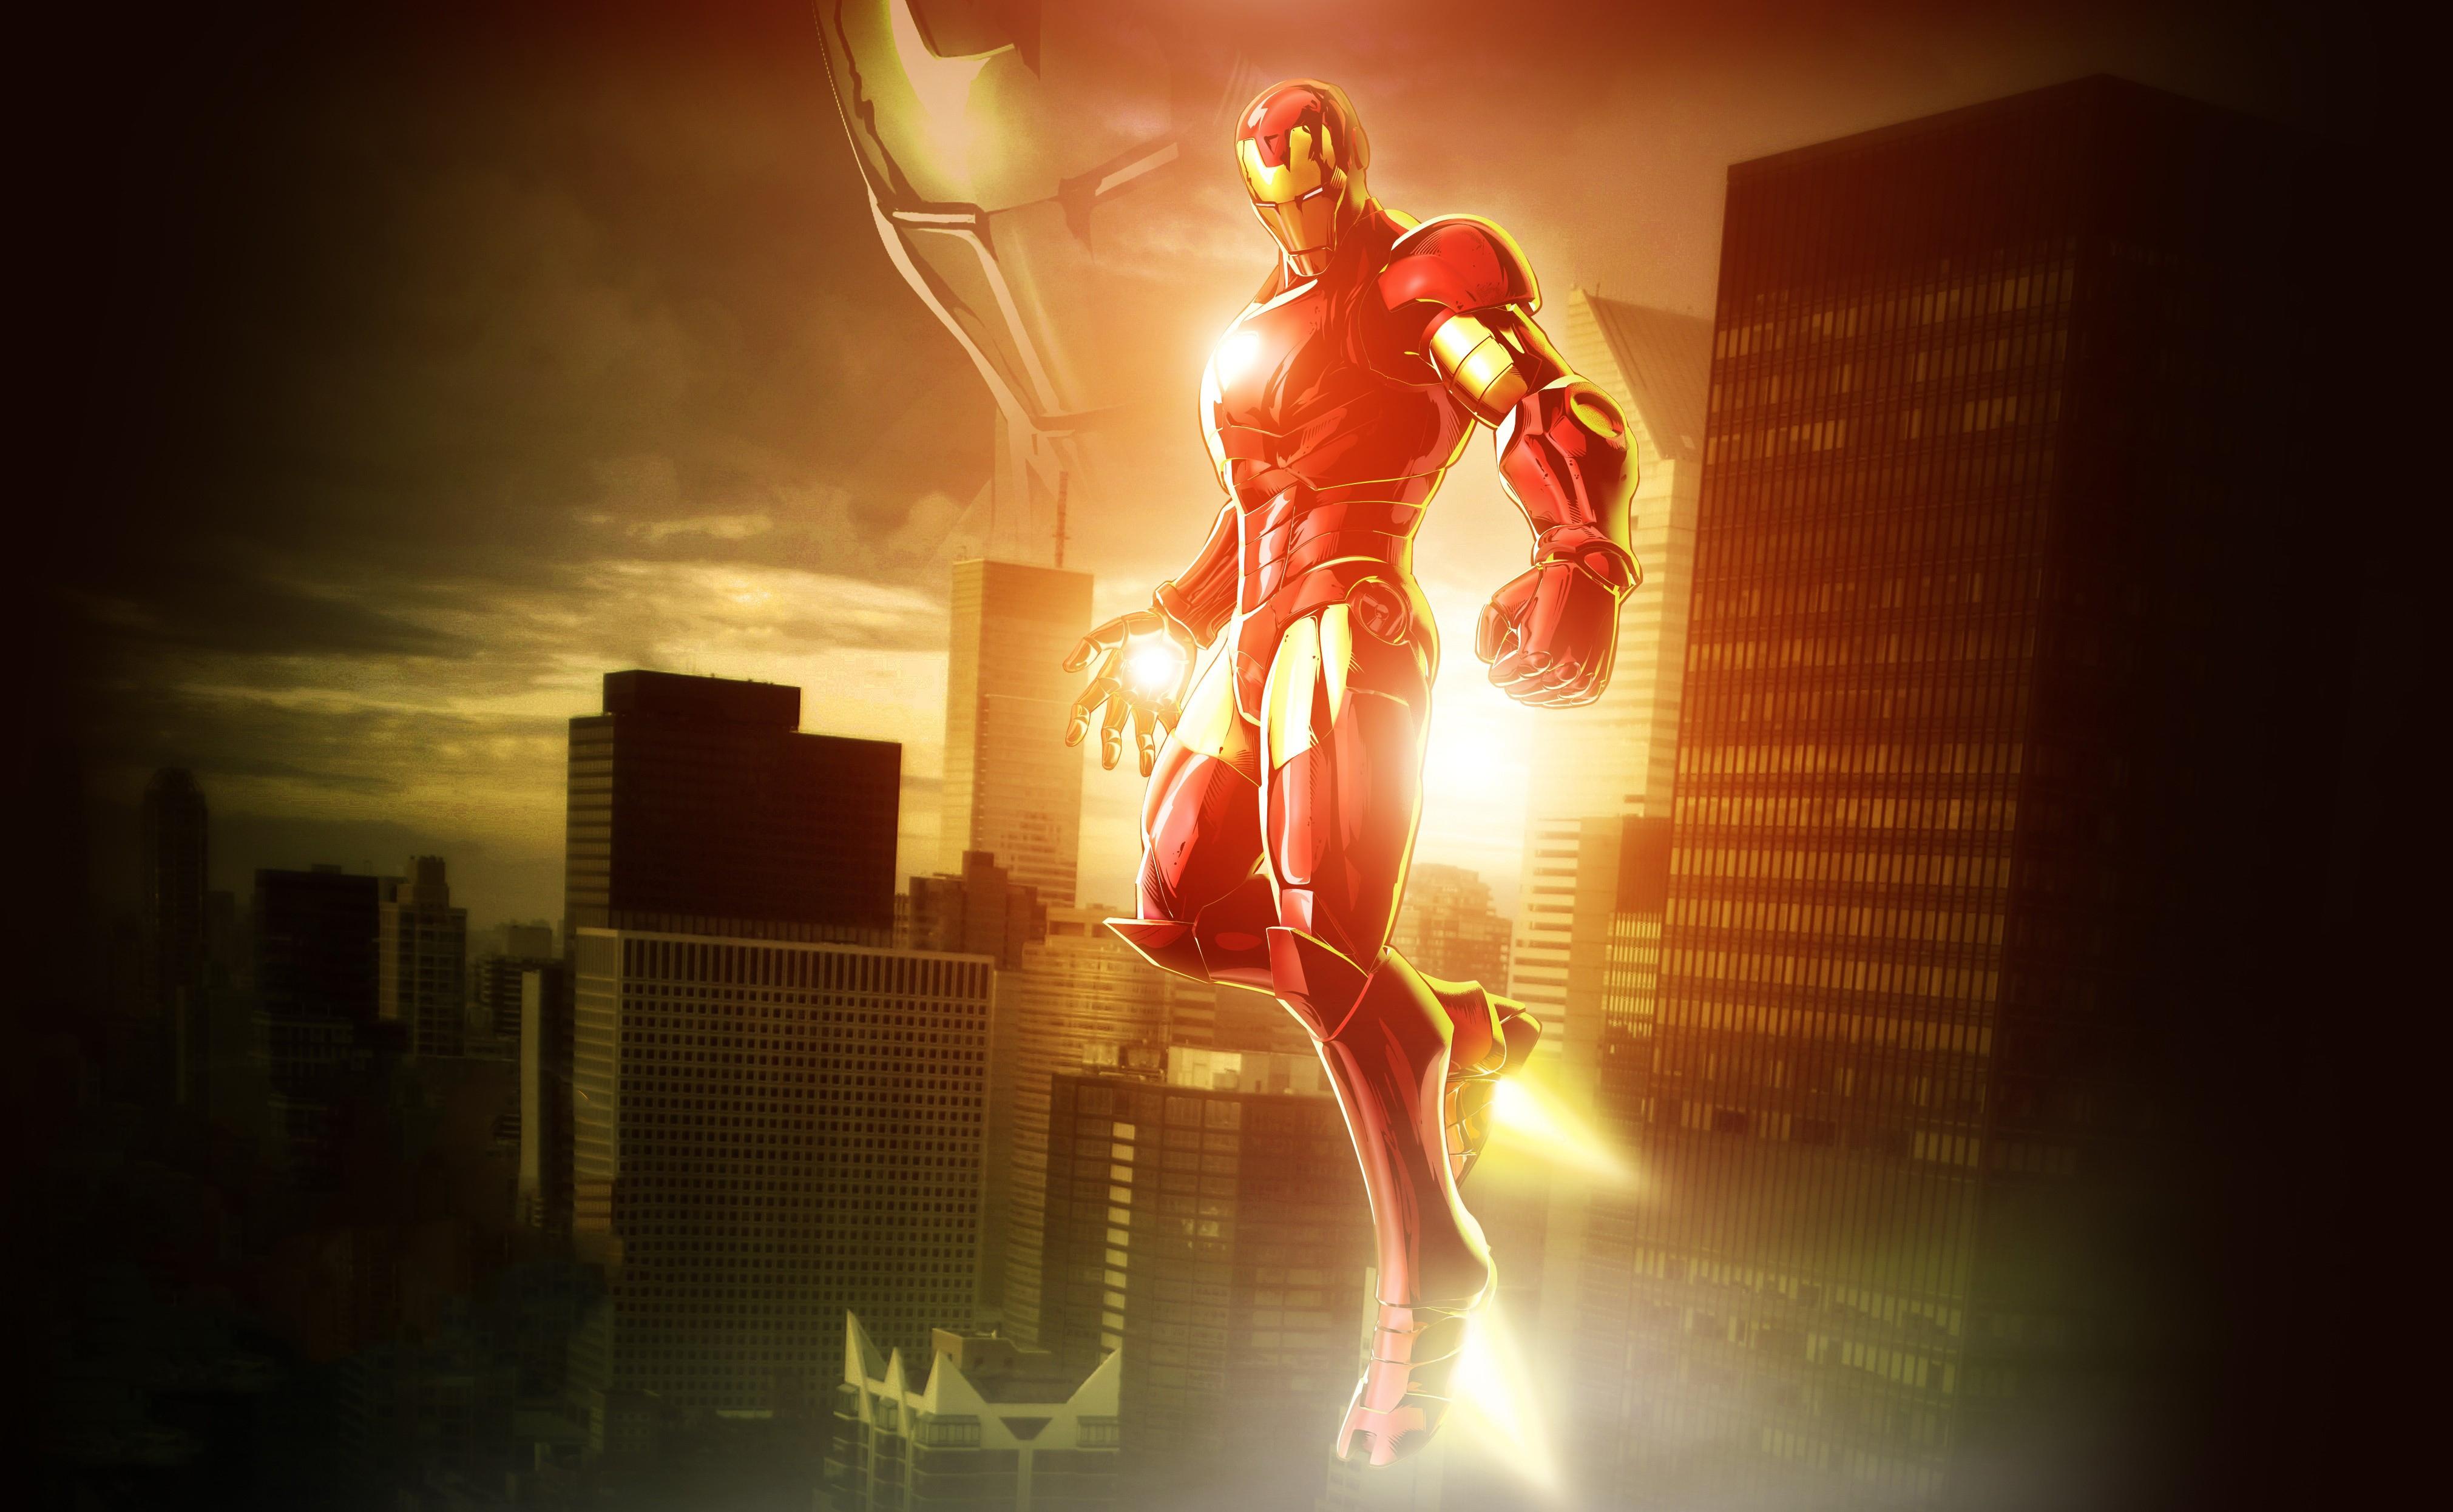 Iron Man 3 Hd Wallpapers High Resolution: 1366x768 Marvel Vs Capcom 3 Iron Man 4k 1366x768